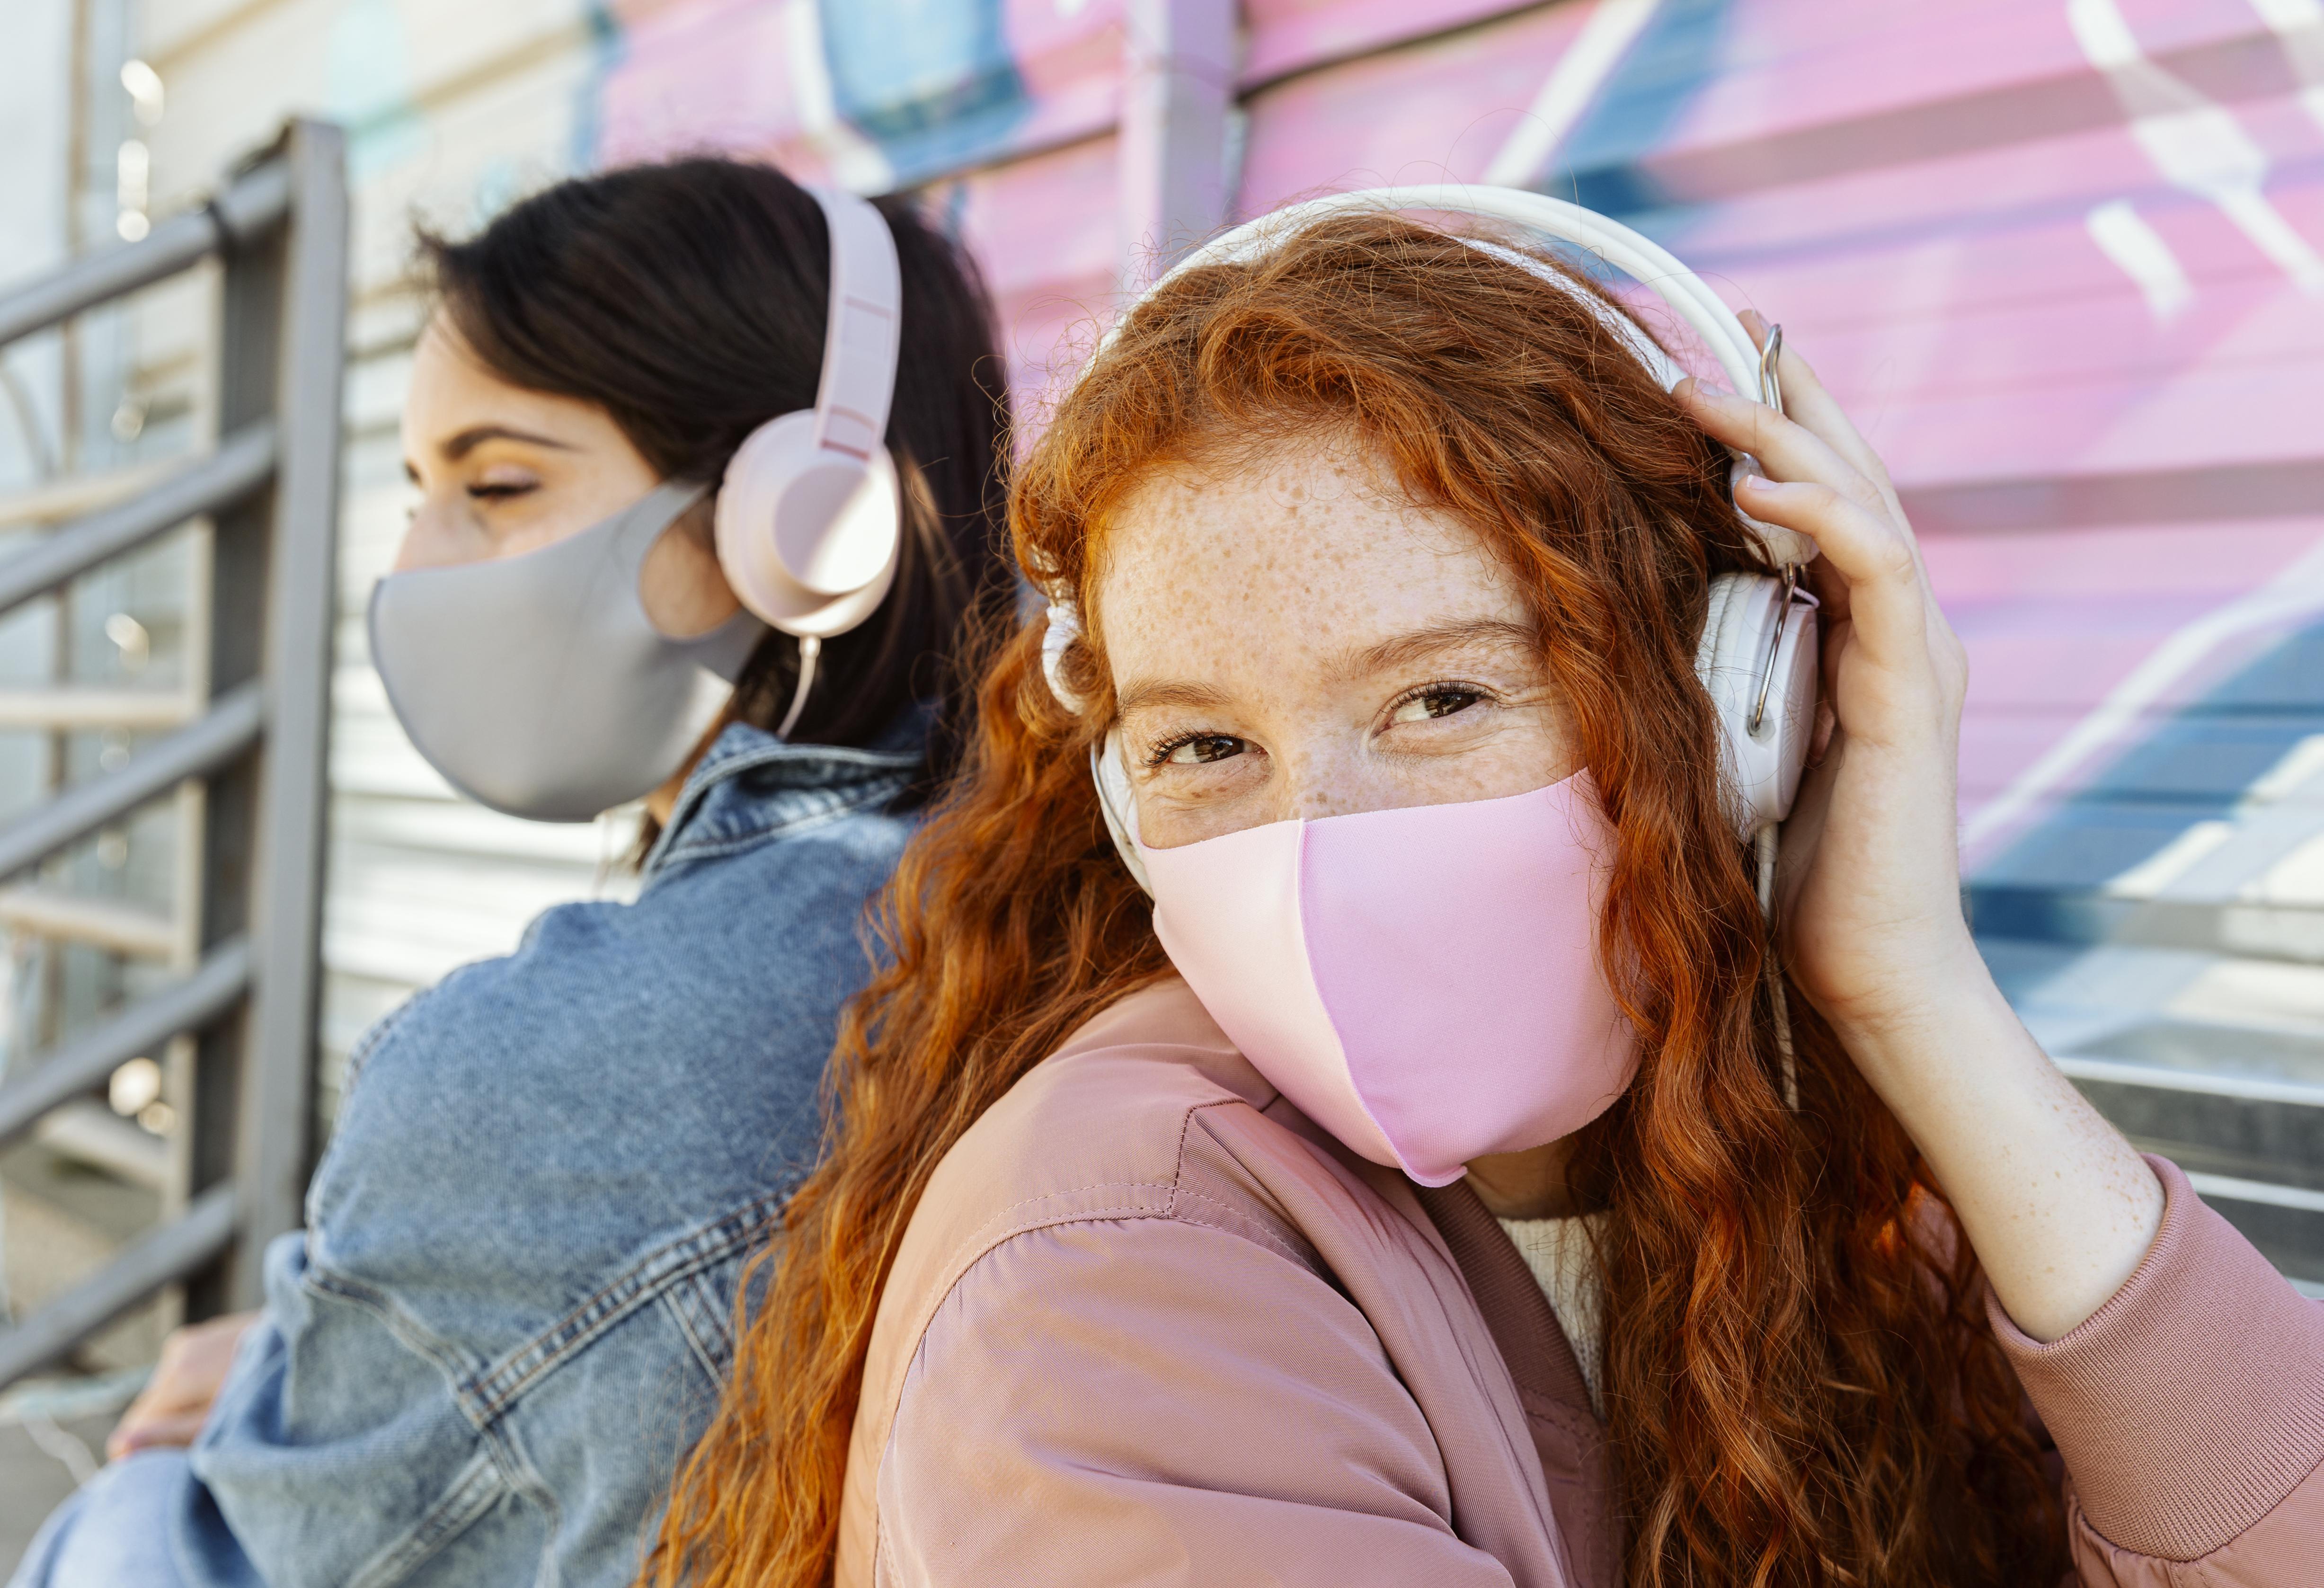 female-friends-with-face-masks-outdoors-listening-music-headphones.jpg